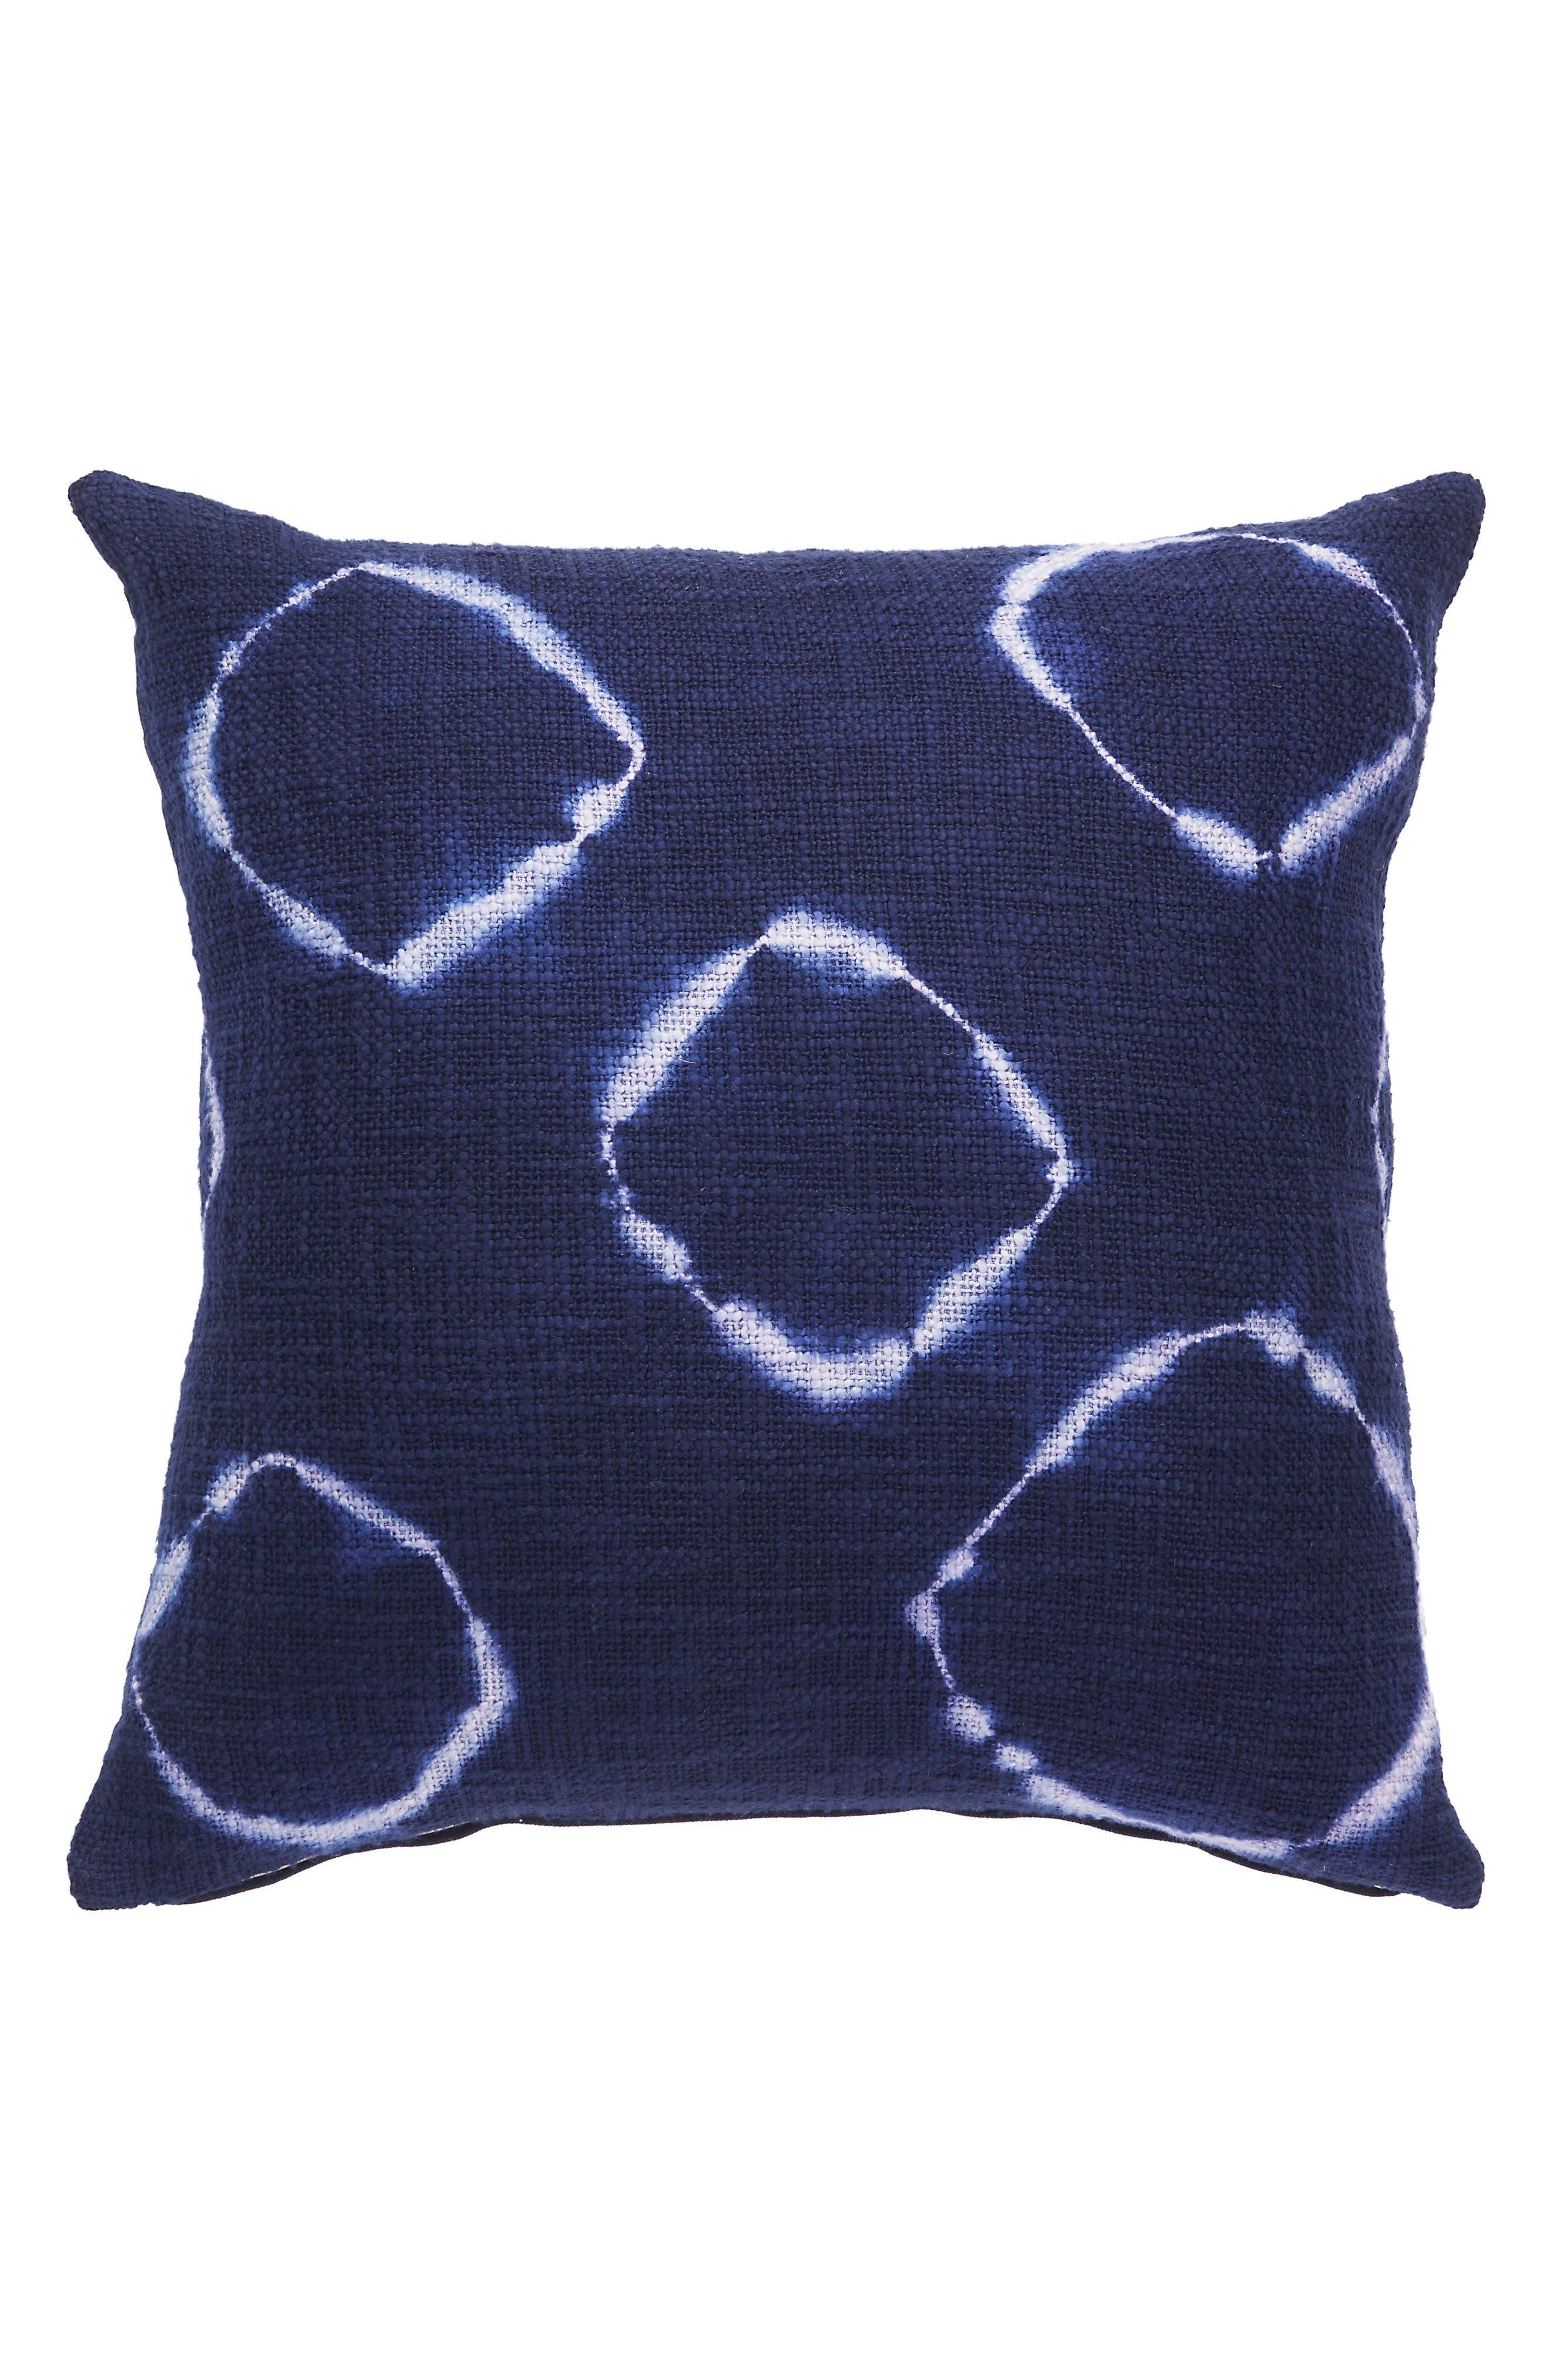 Medieval Blue Accent Pillow,                         Main,                         color, Medieval Blue